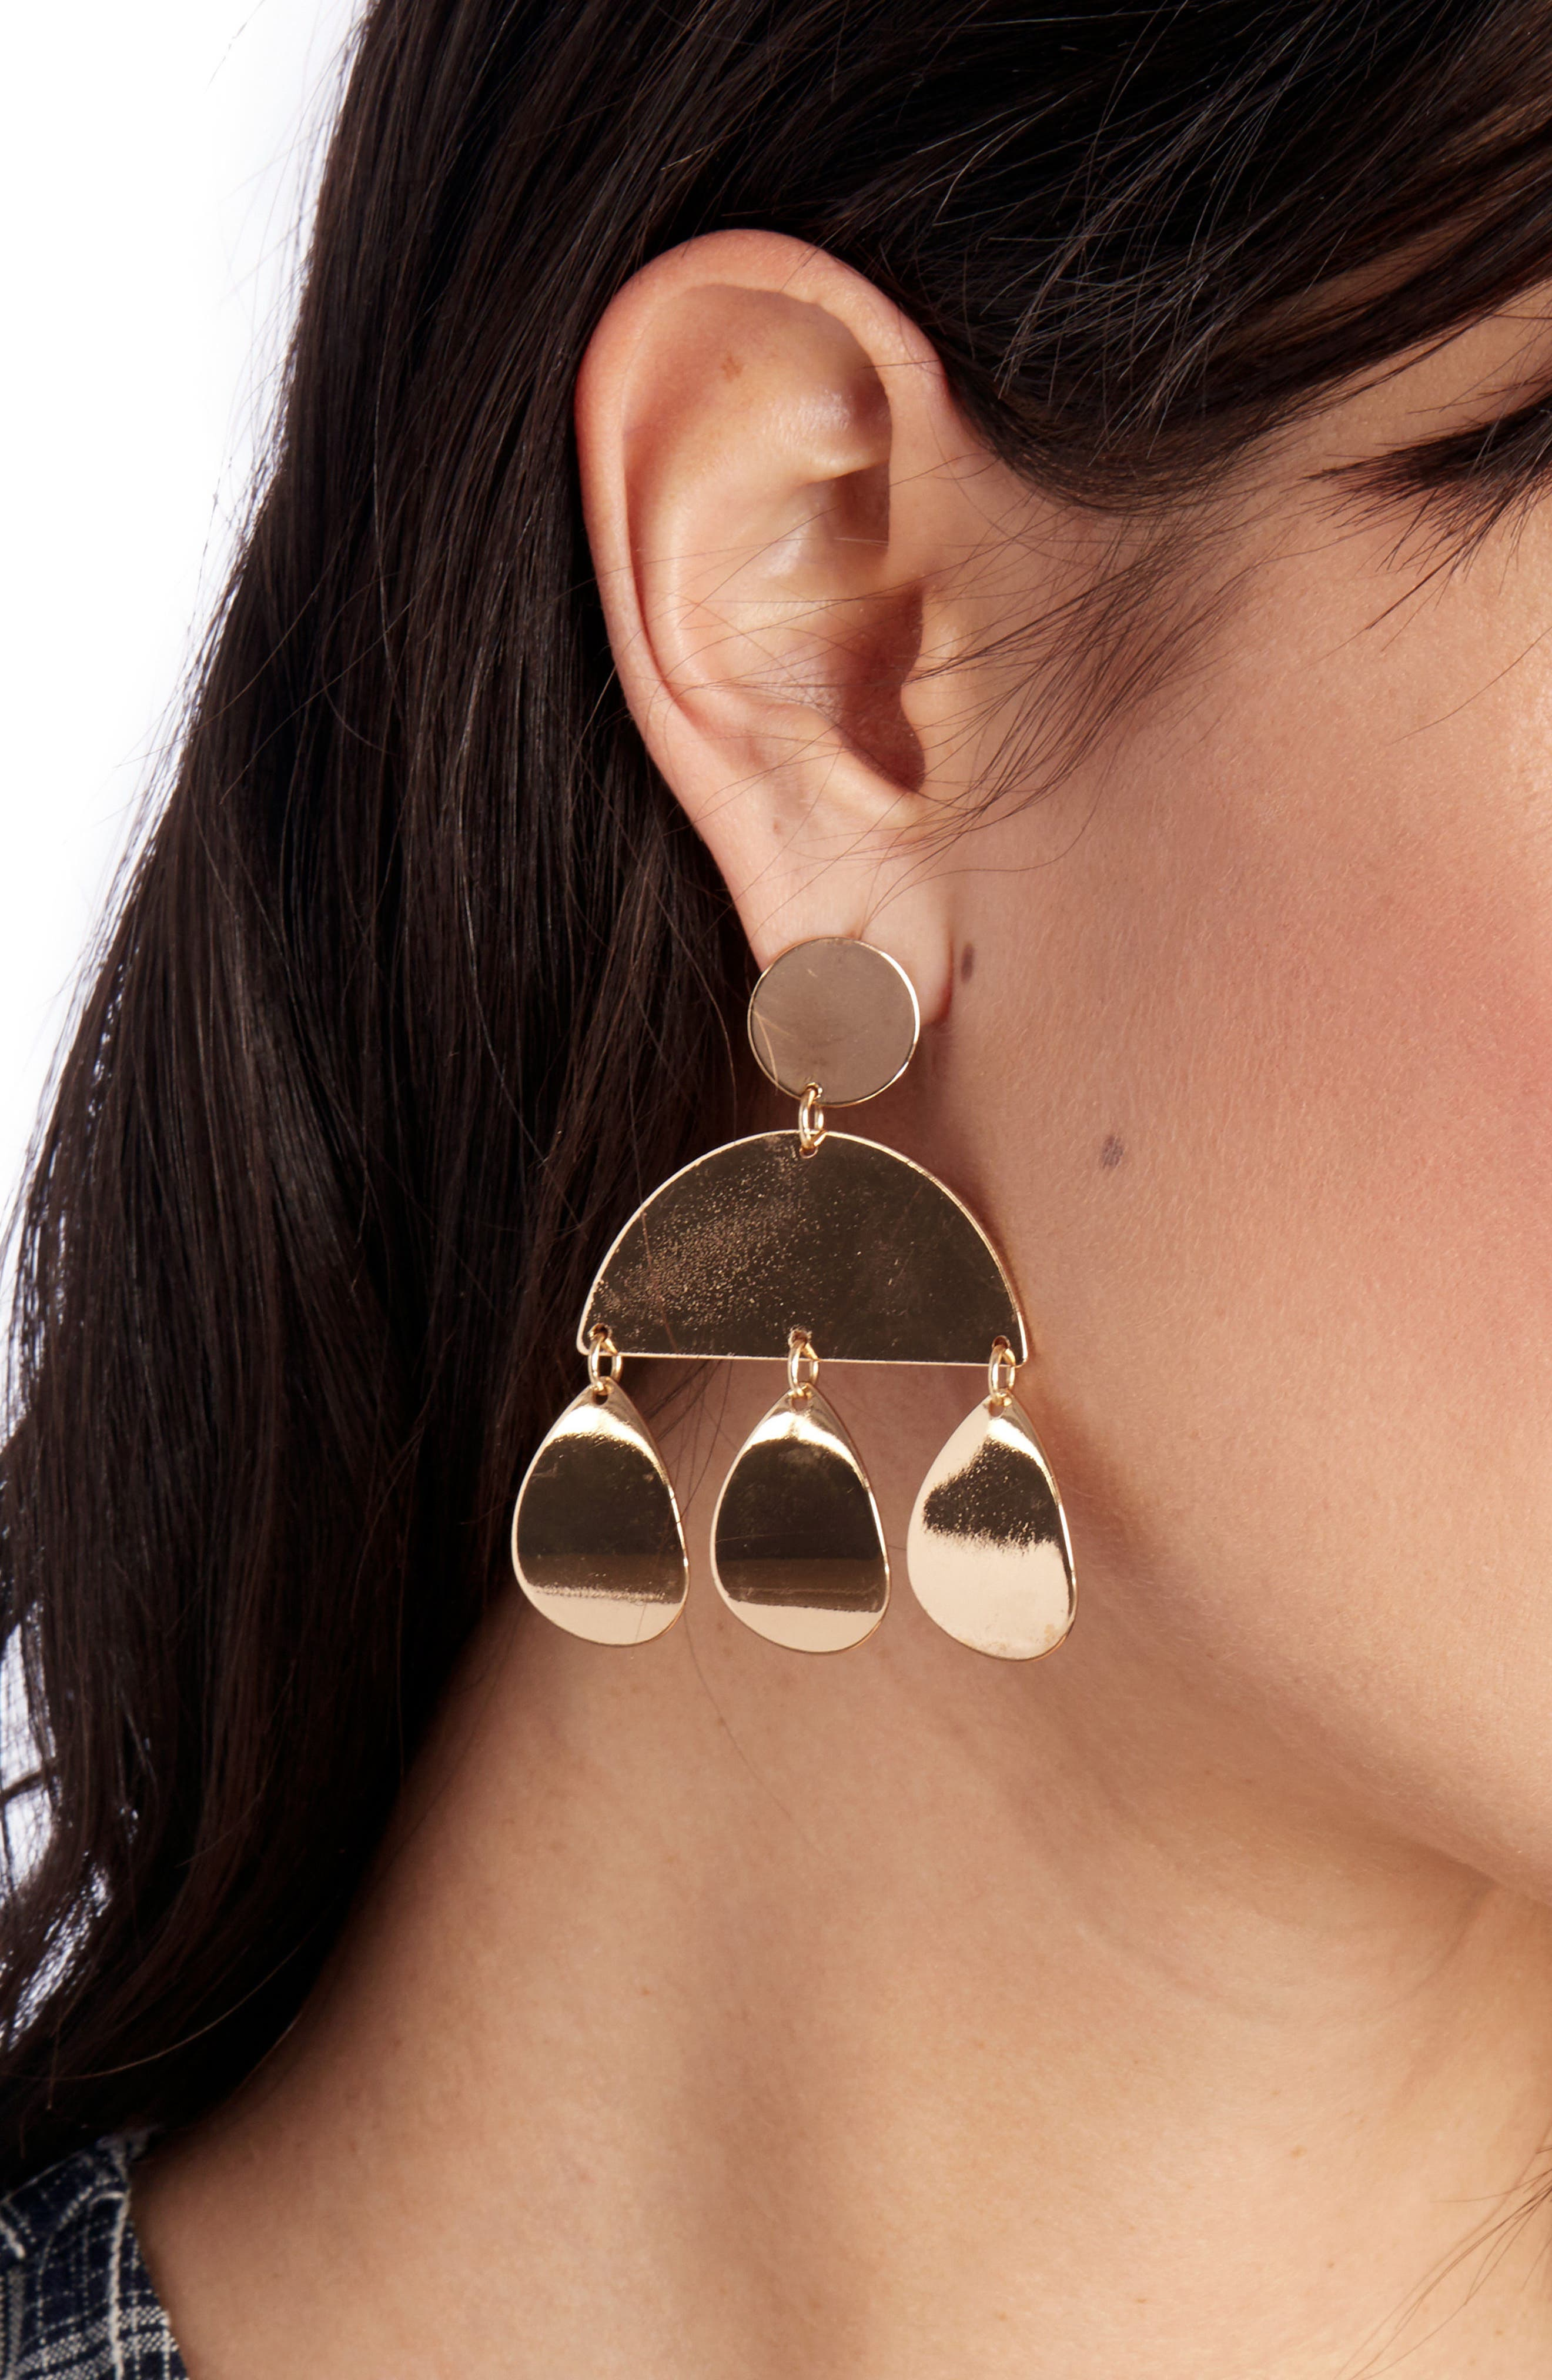 Geometric Plate Earrings,                             Alternate thumbnail 2, color,                             710